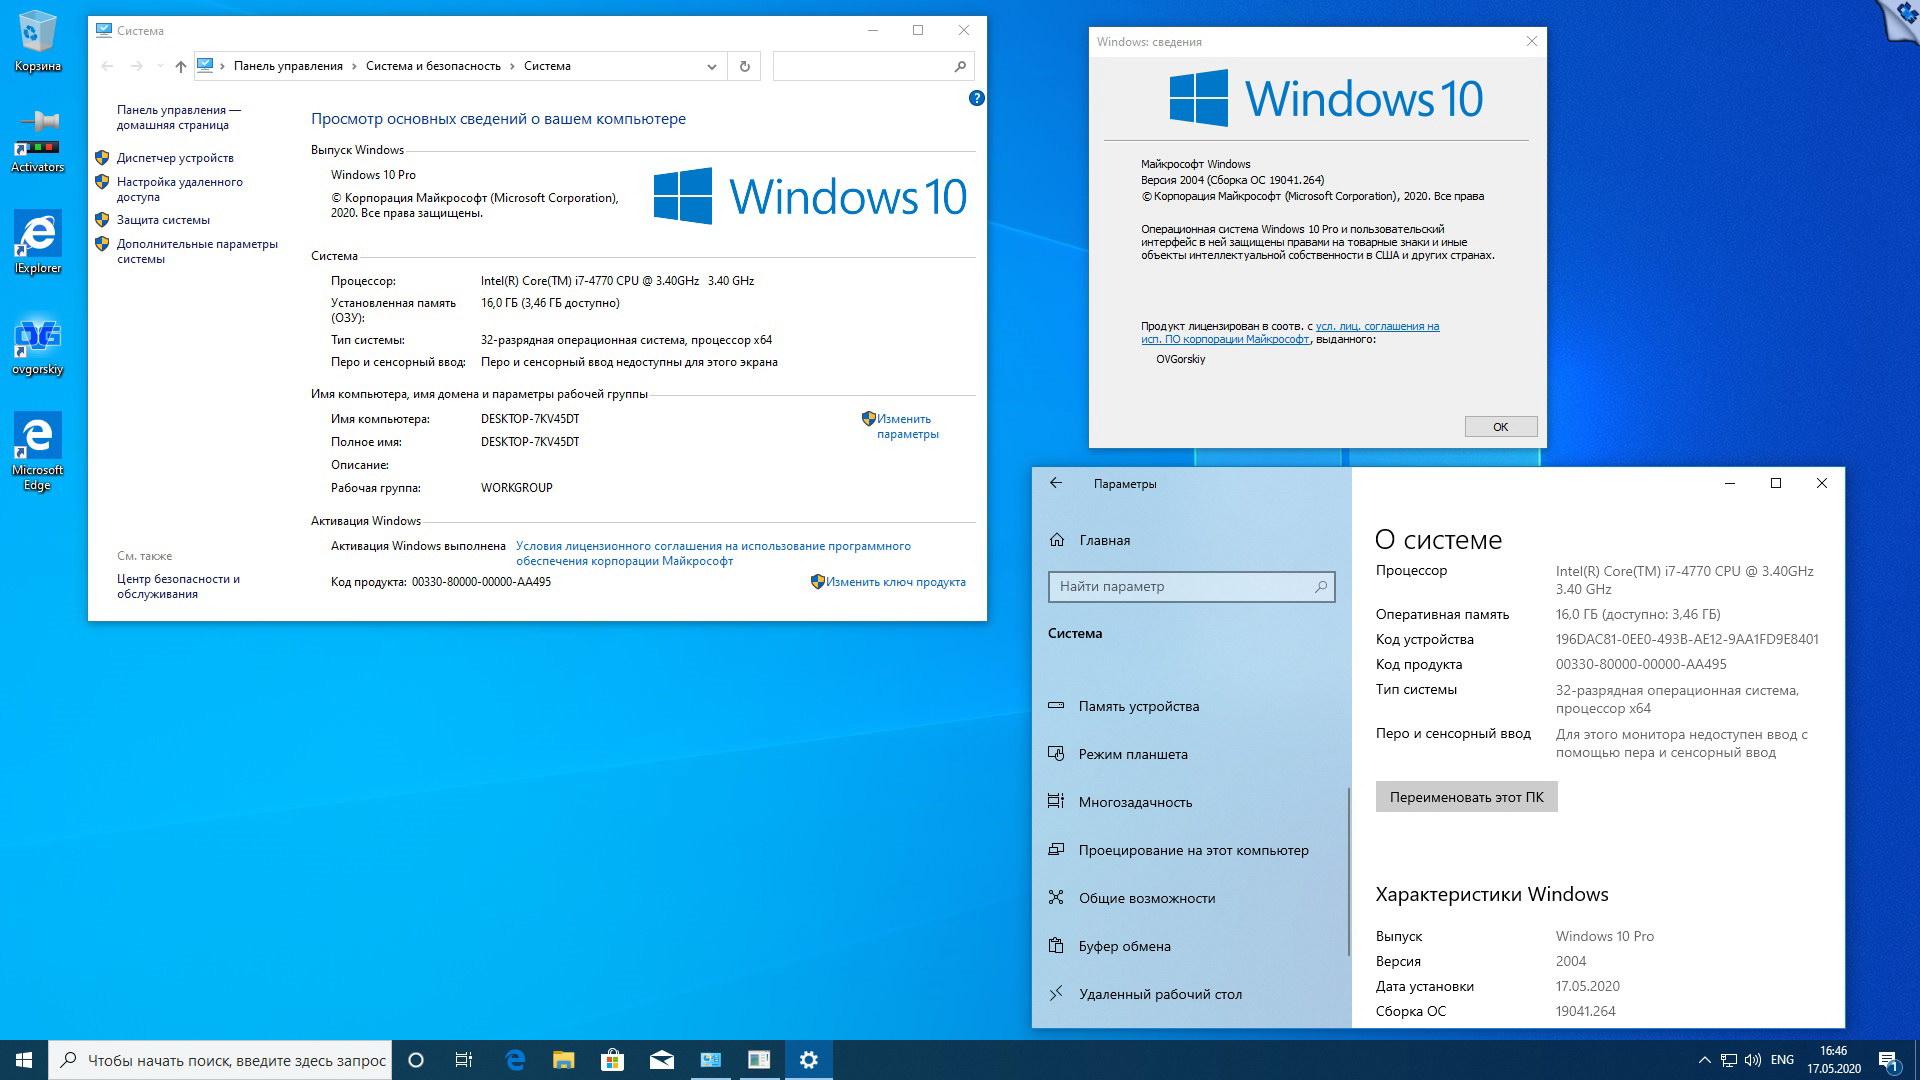 Microsoft® Windows 10 x86-x64 Ru 2004 20H1 8in2 Orig-Upd 08.2020 by OVGorskiy® 2DVD